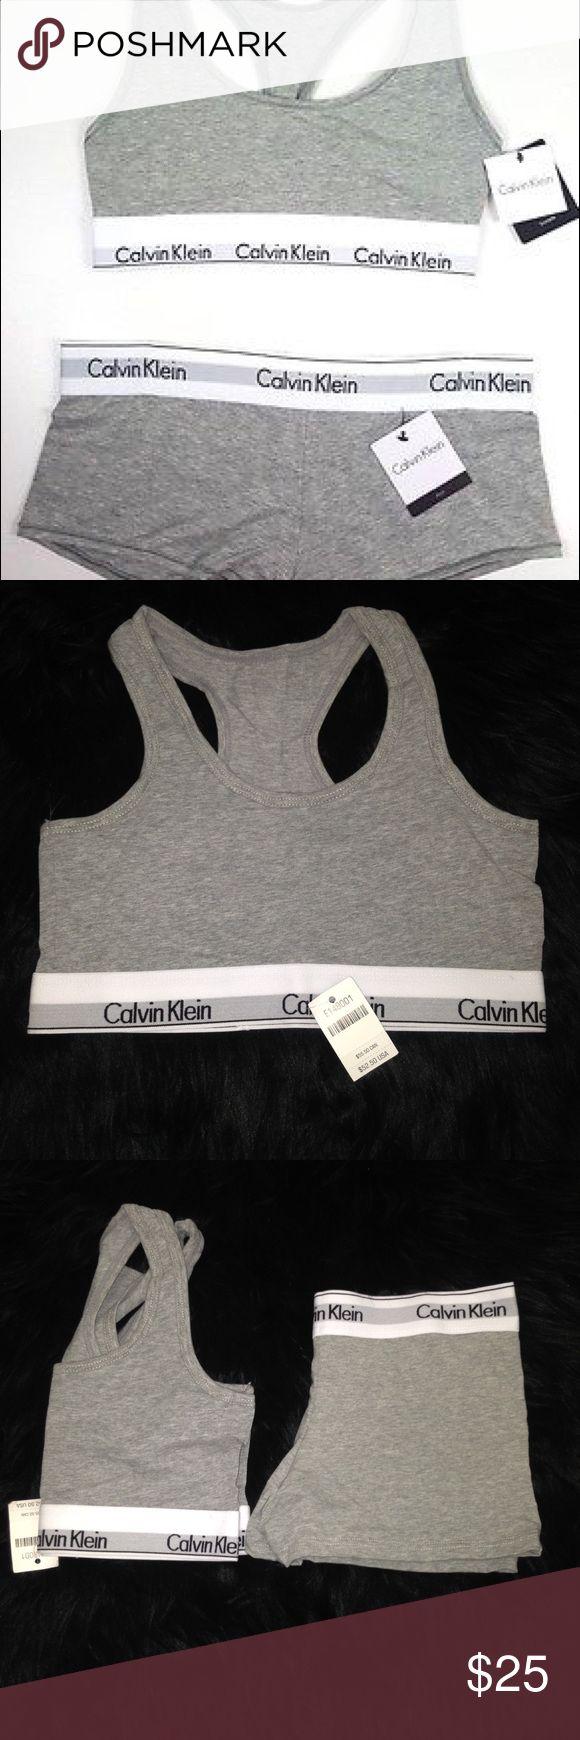 🚨ONE DAY SALE🚨 NWT CALVIN KLEIN BRALETTE NEW WITH TAG CALVIN KLEIN BRALETTE SIZE M (boyshorts not included) Calvin Klein Intimates & Sleepwear Bras